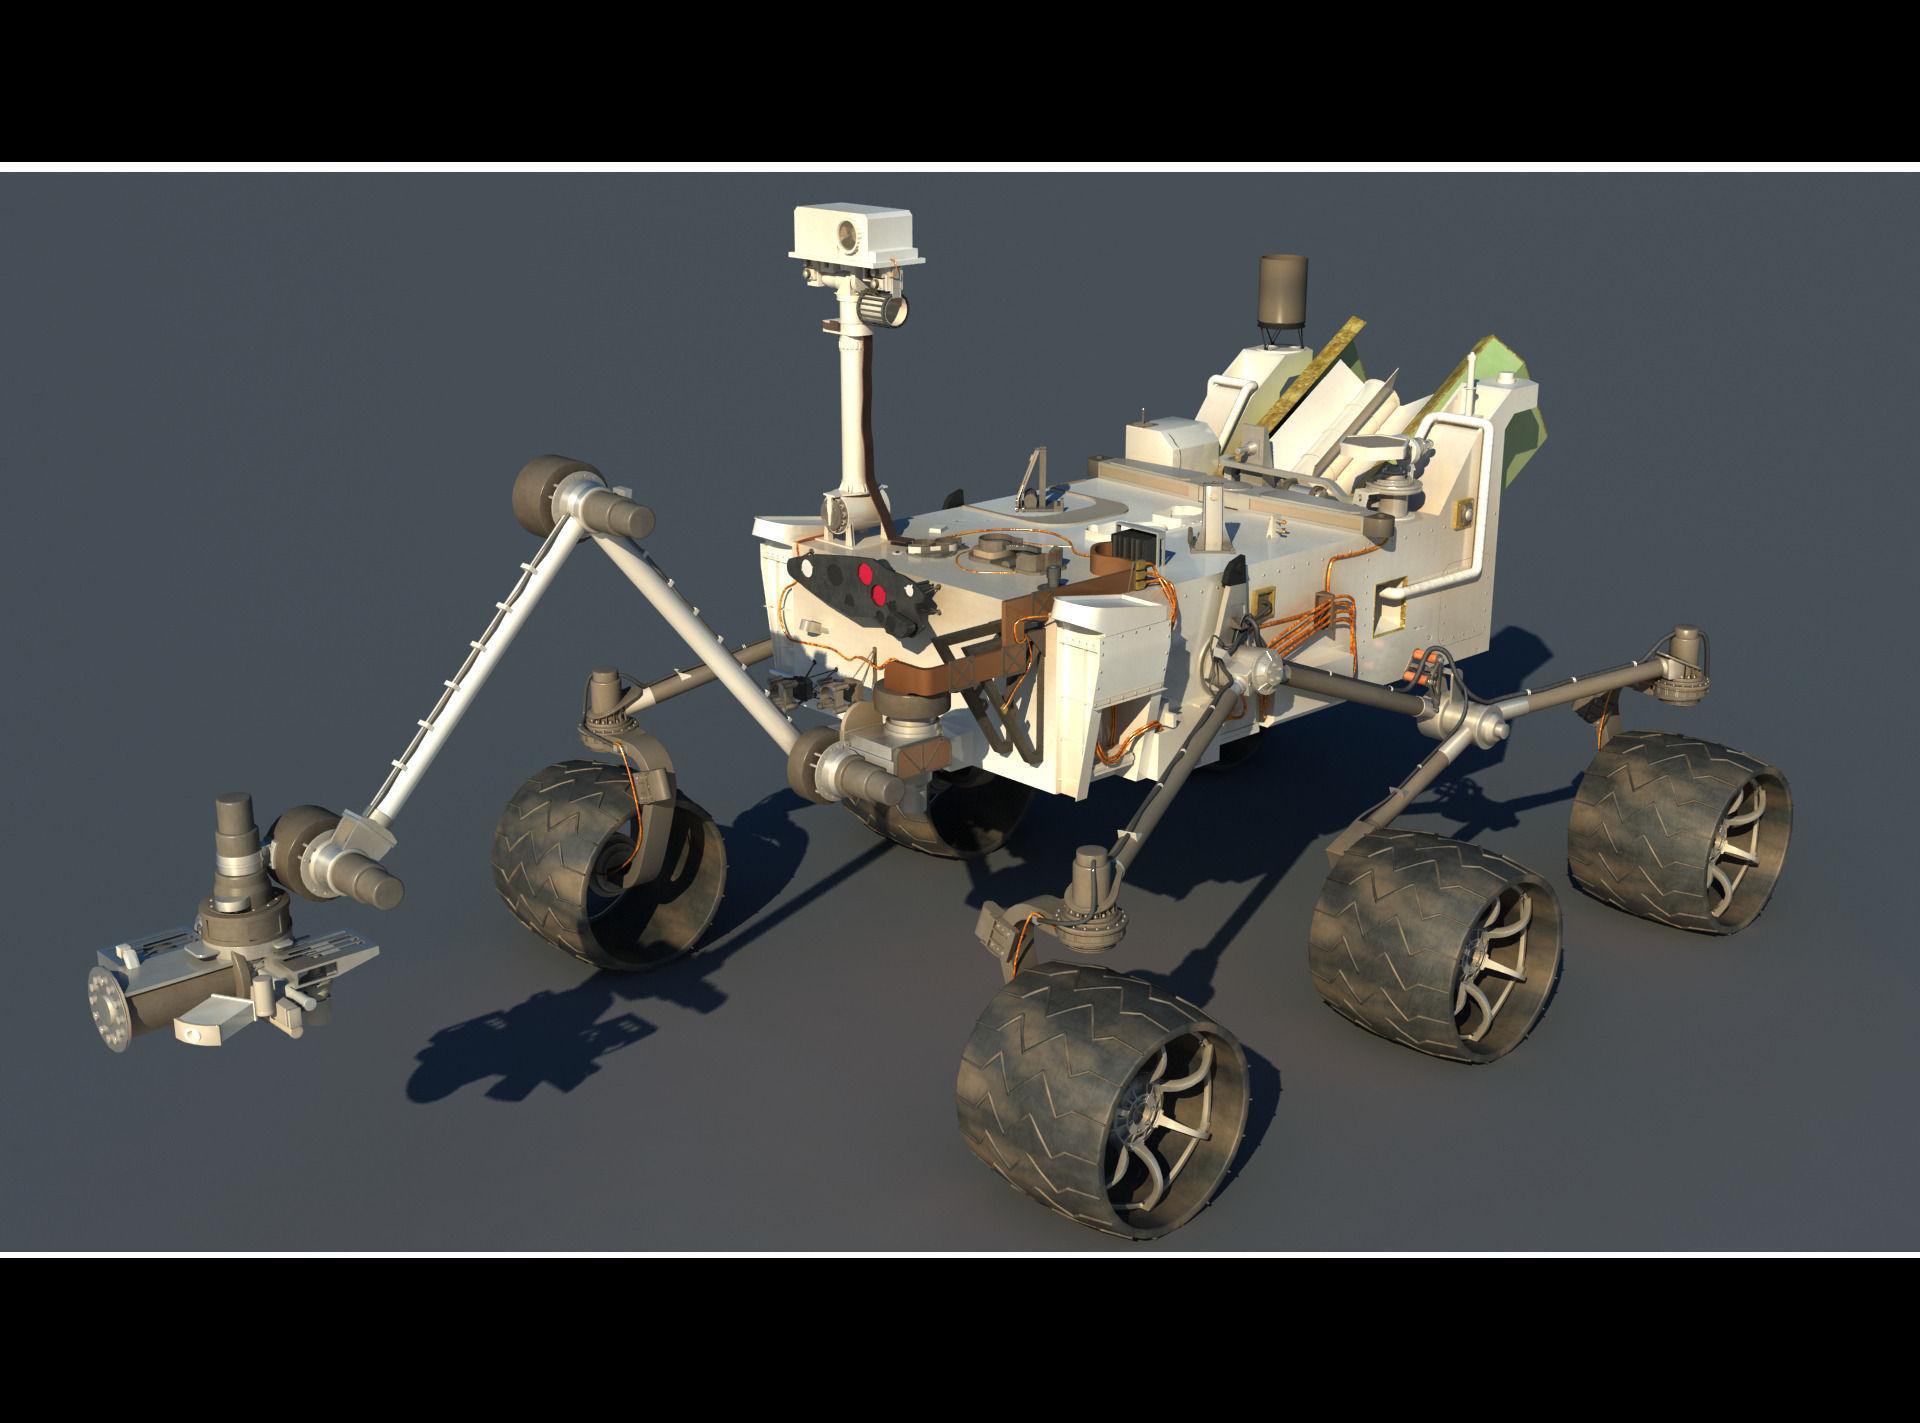 CURIOSITY ROVER-MARS SCIENCE LABORATORY 3D Model .max .obj ...